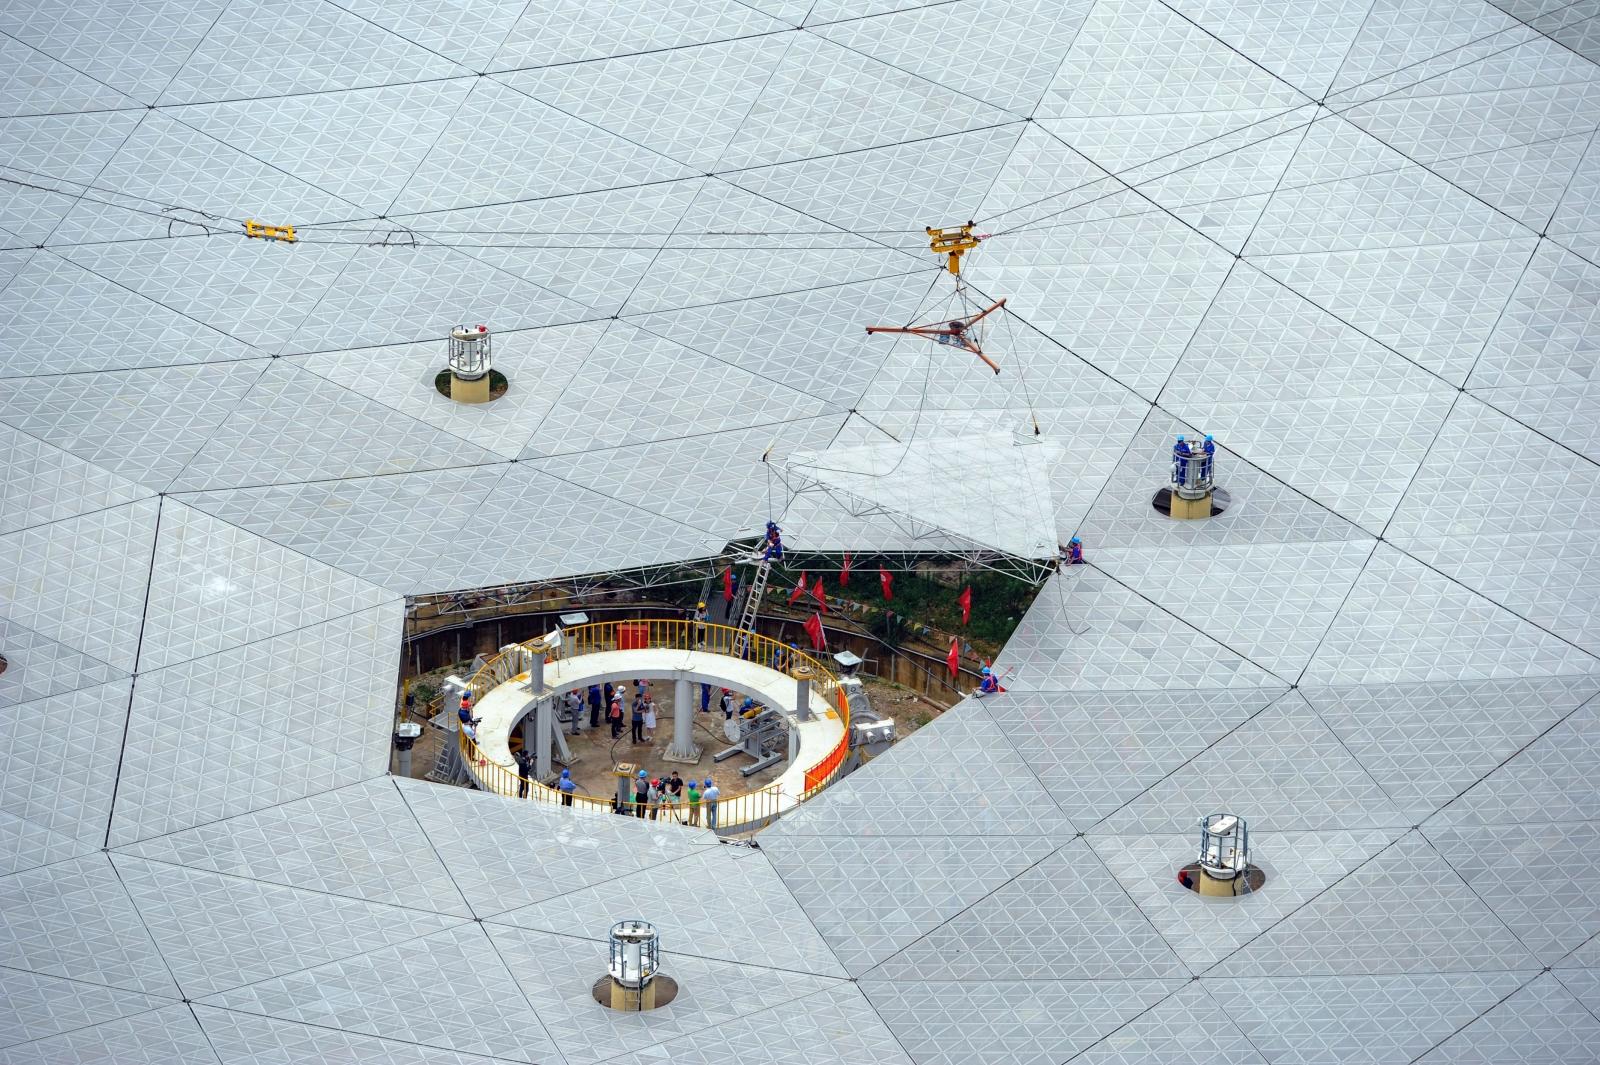 China builds world's largest radio telescope